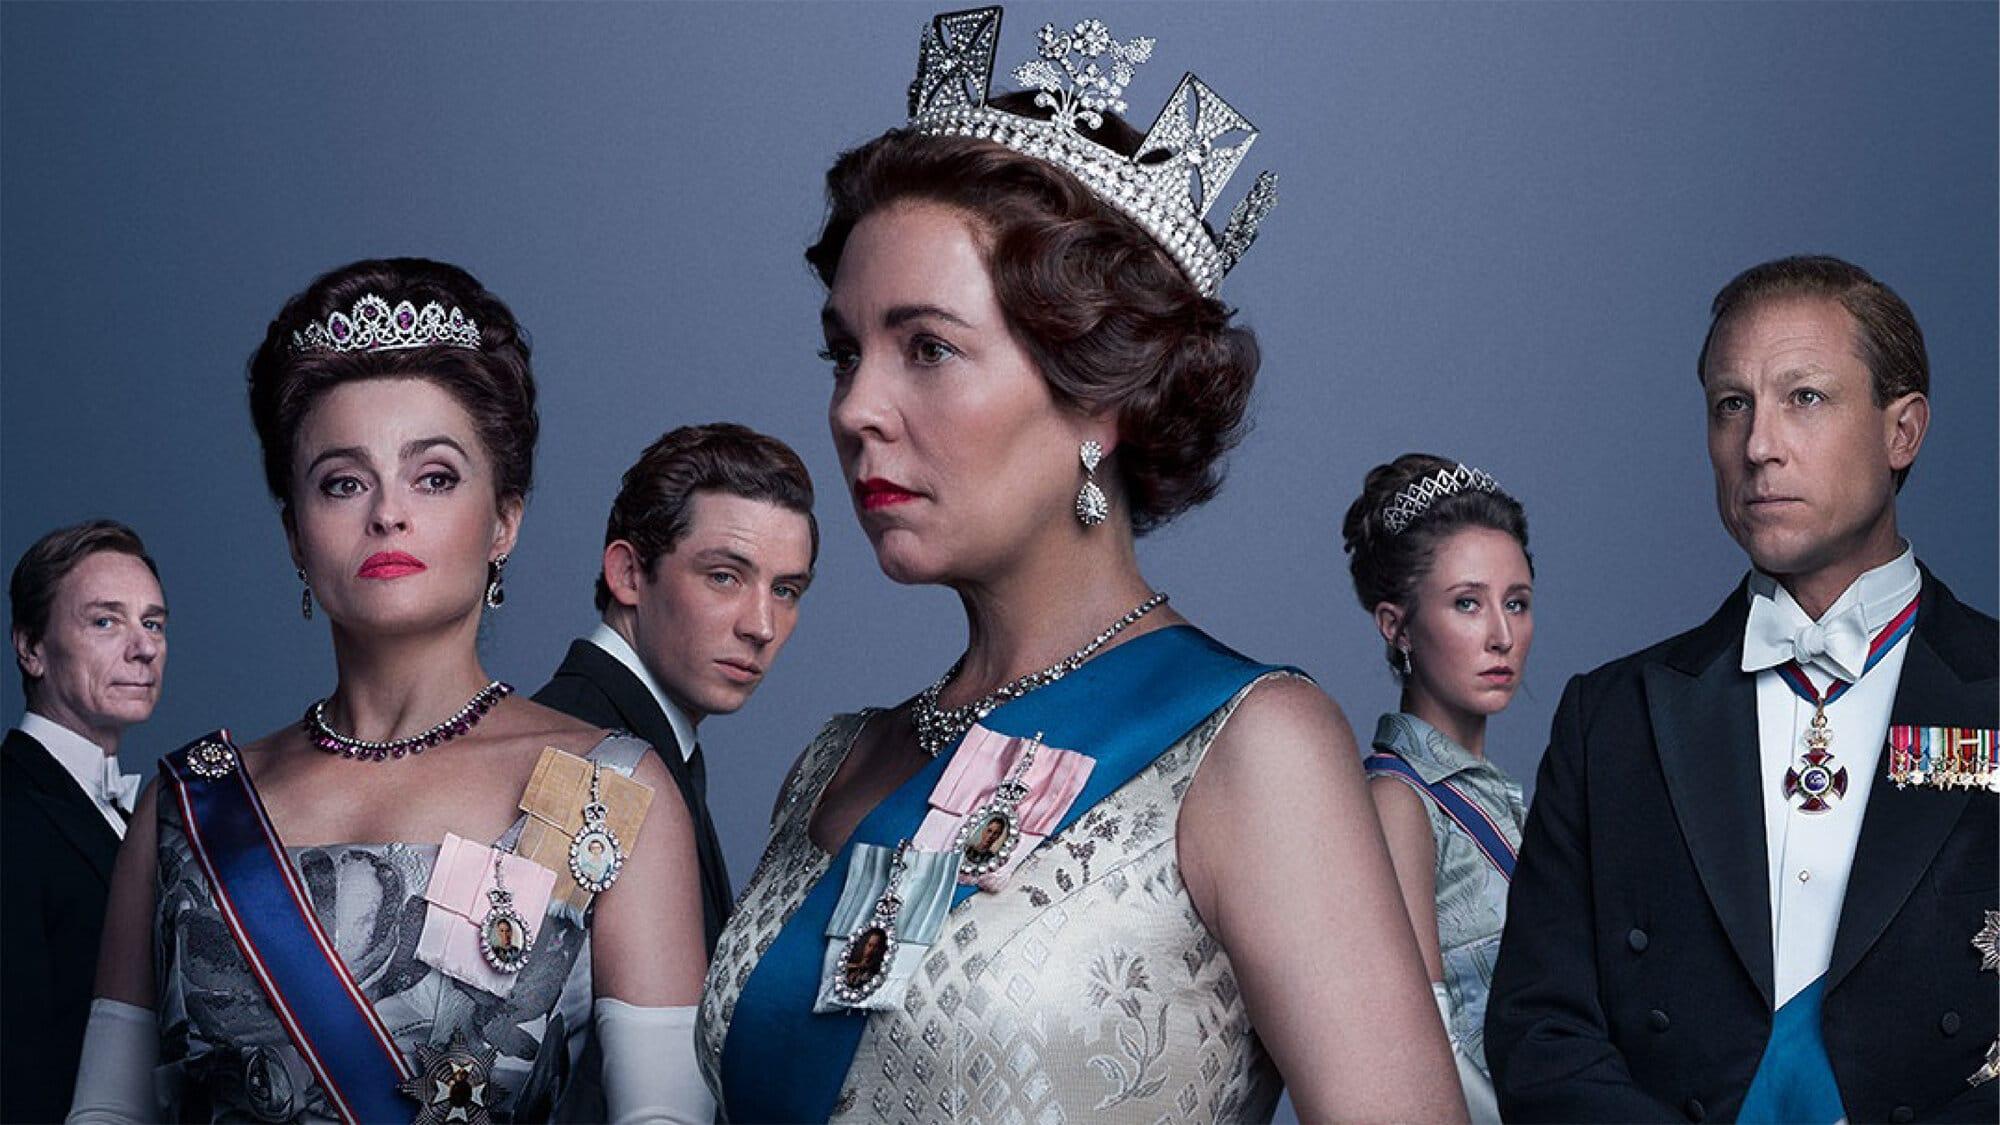 A Korona Sorozat 4 Evad Netflix Fikcio Brit Kulturalis Miniszter